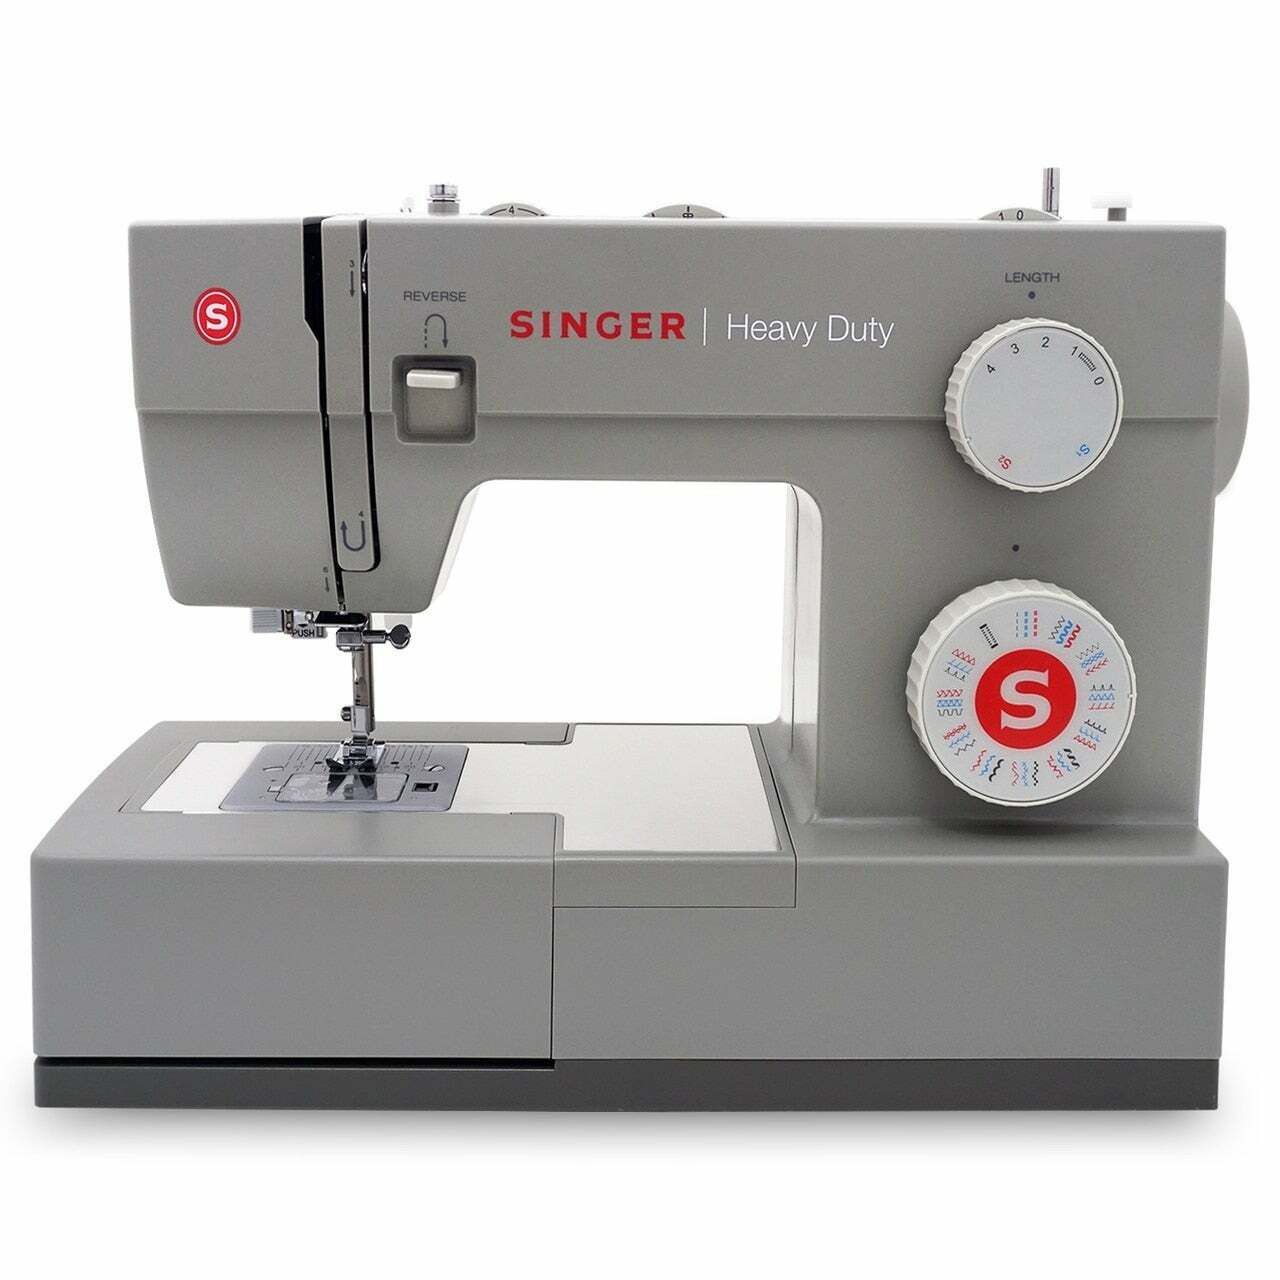 s l1600 - SINGER 4452 Heavy Duty Sewing Machine